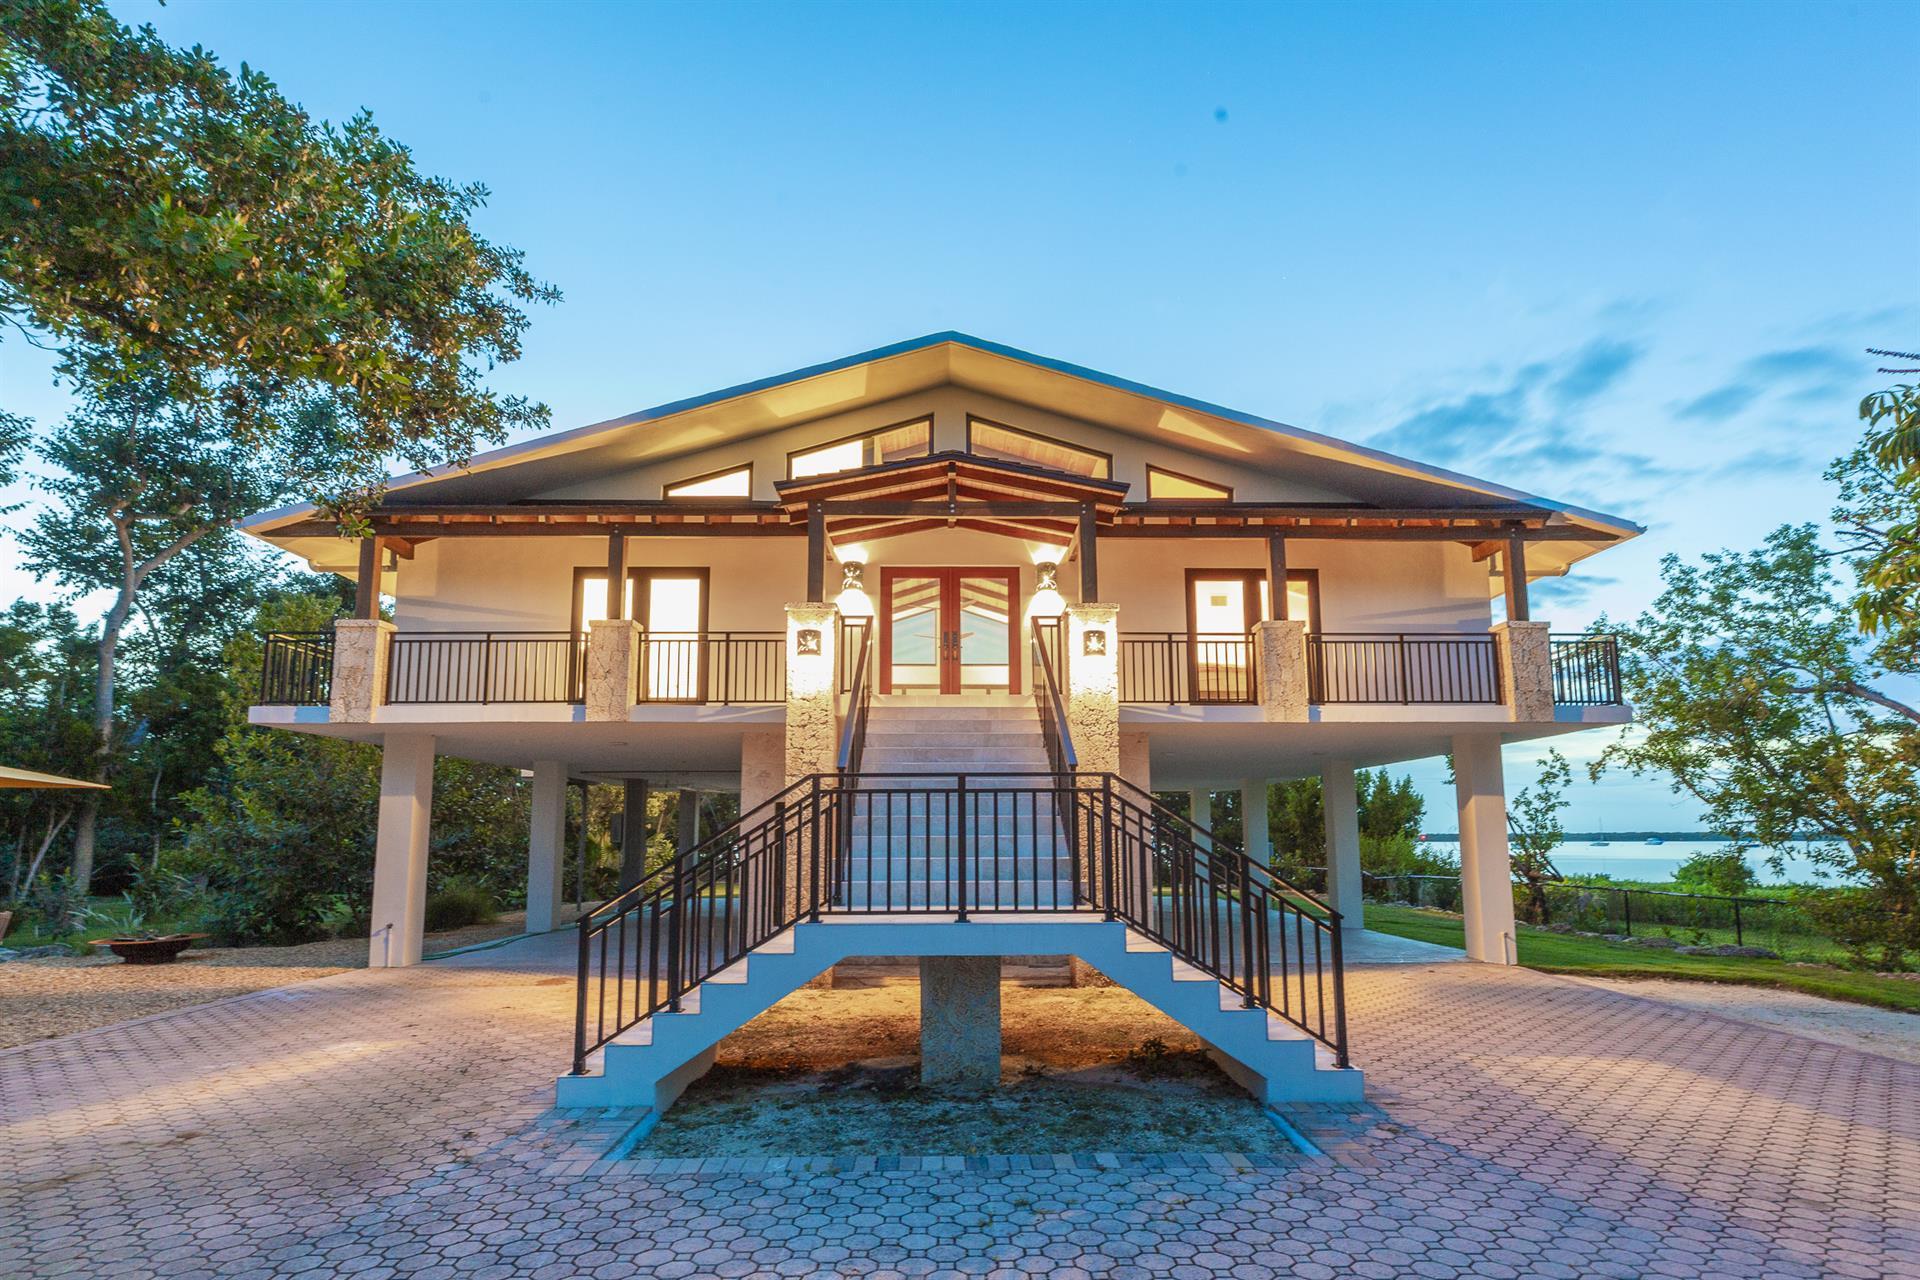 Awe Inspiring Florida Keys Real Estate And Apartments For Sale Interior Design Ideas Gresisoteloinfo